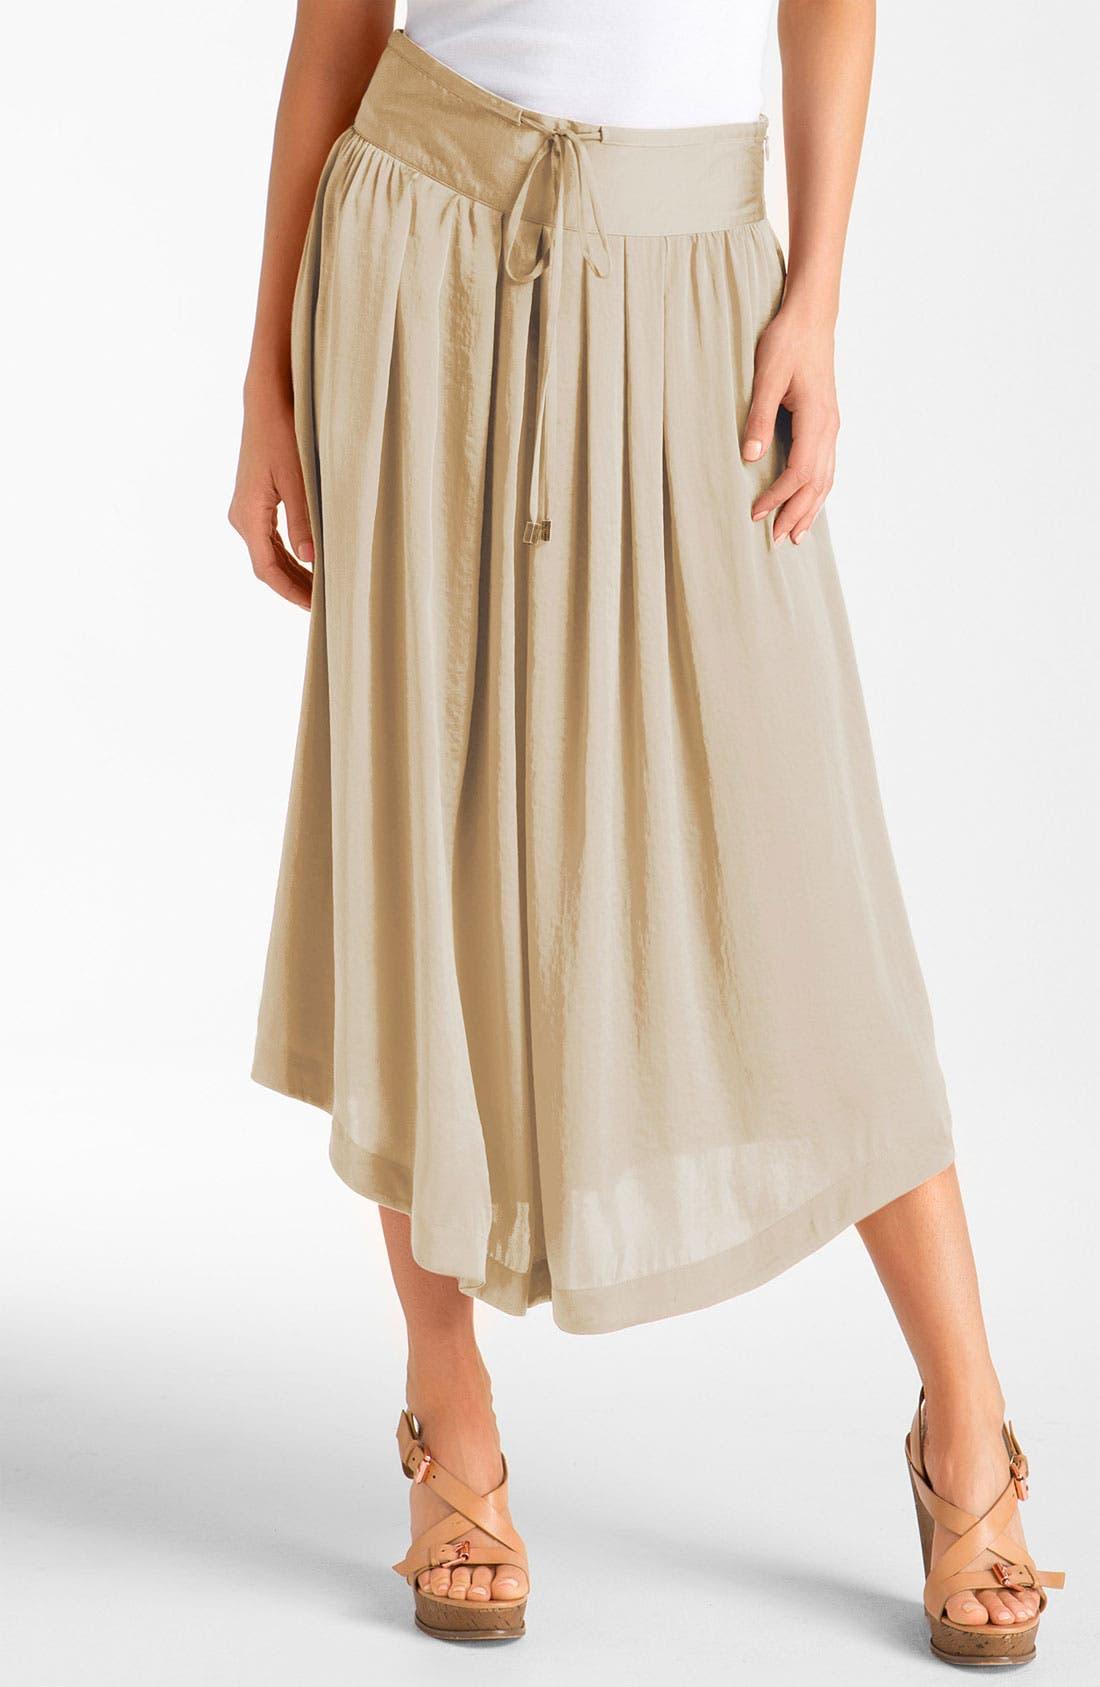 Alternate Image 1 Selected - Vince Camuto 'Shirttail Hem' Midi Skirt